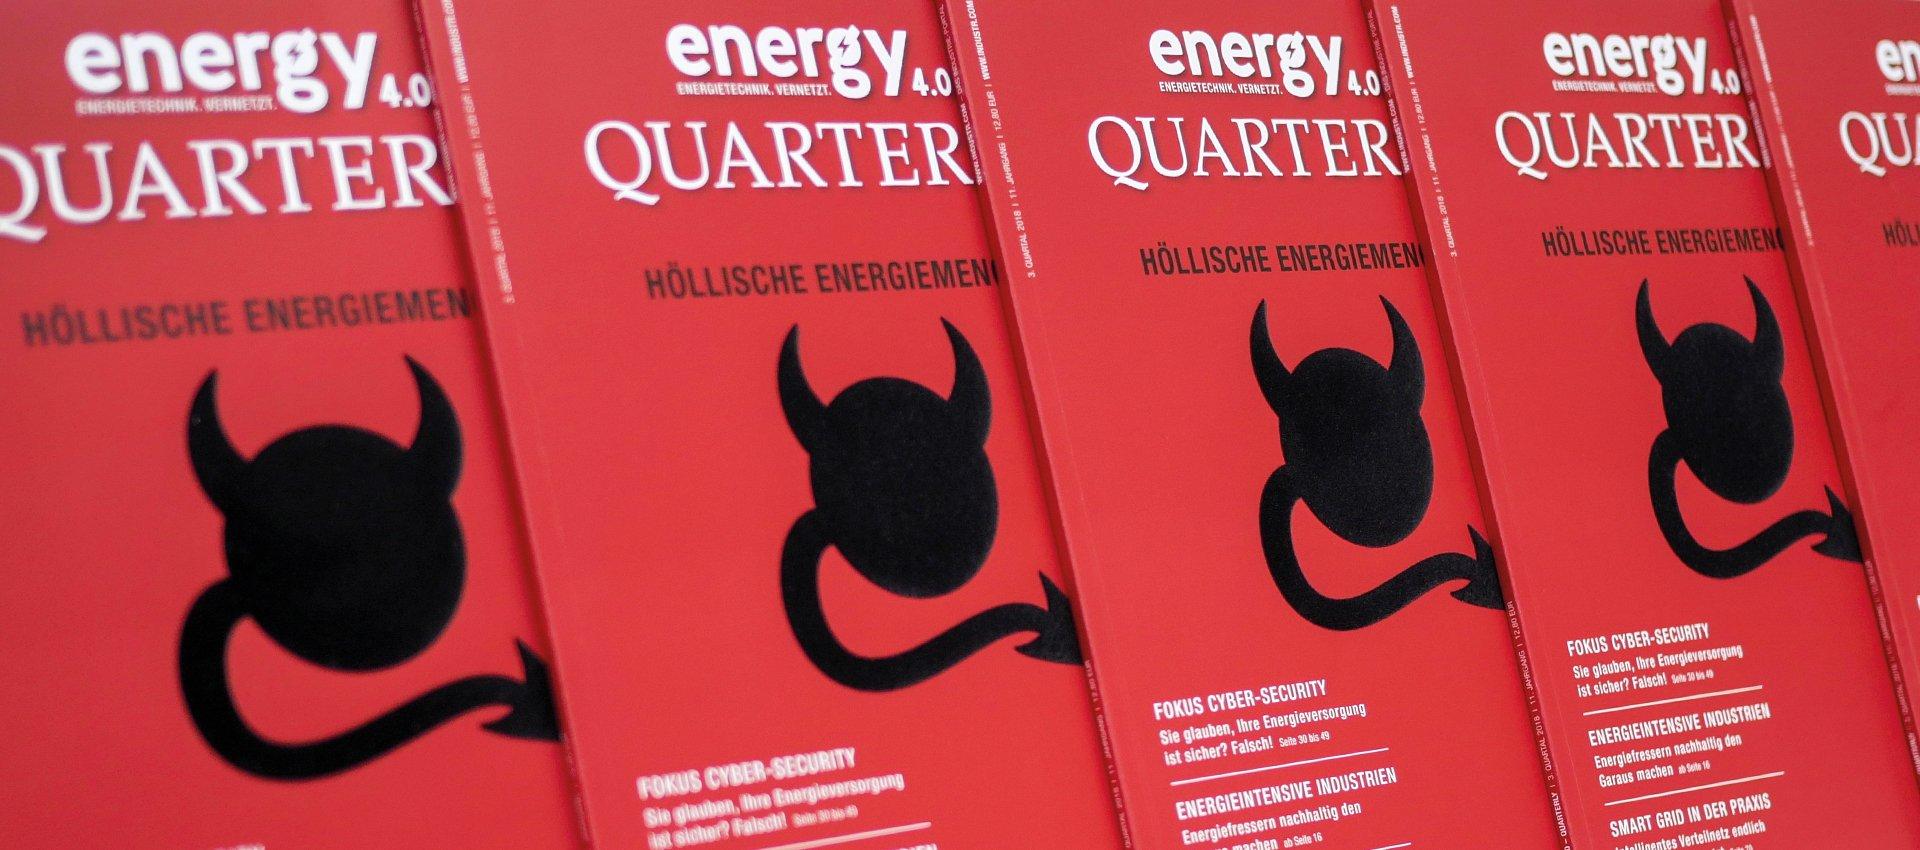 Energy 4.0 Mediadaten